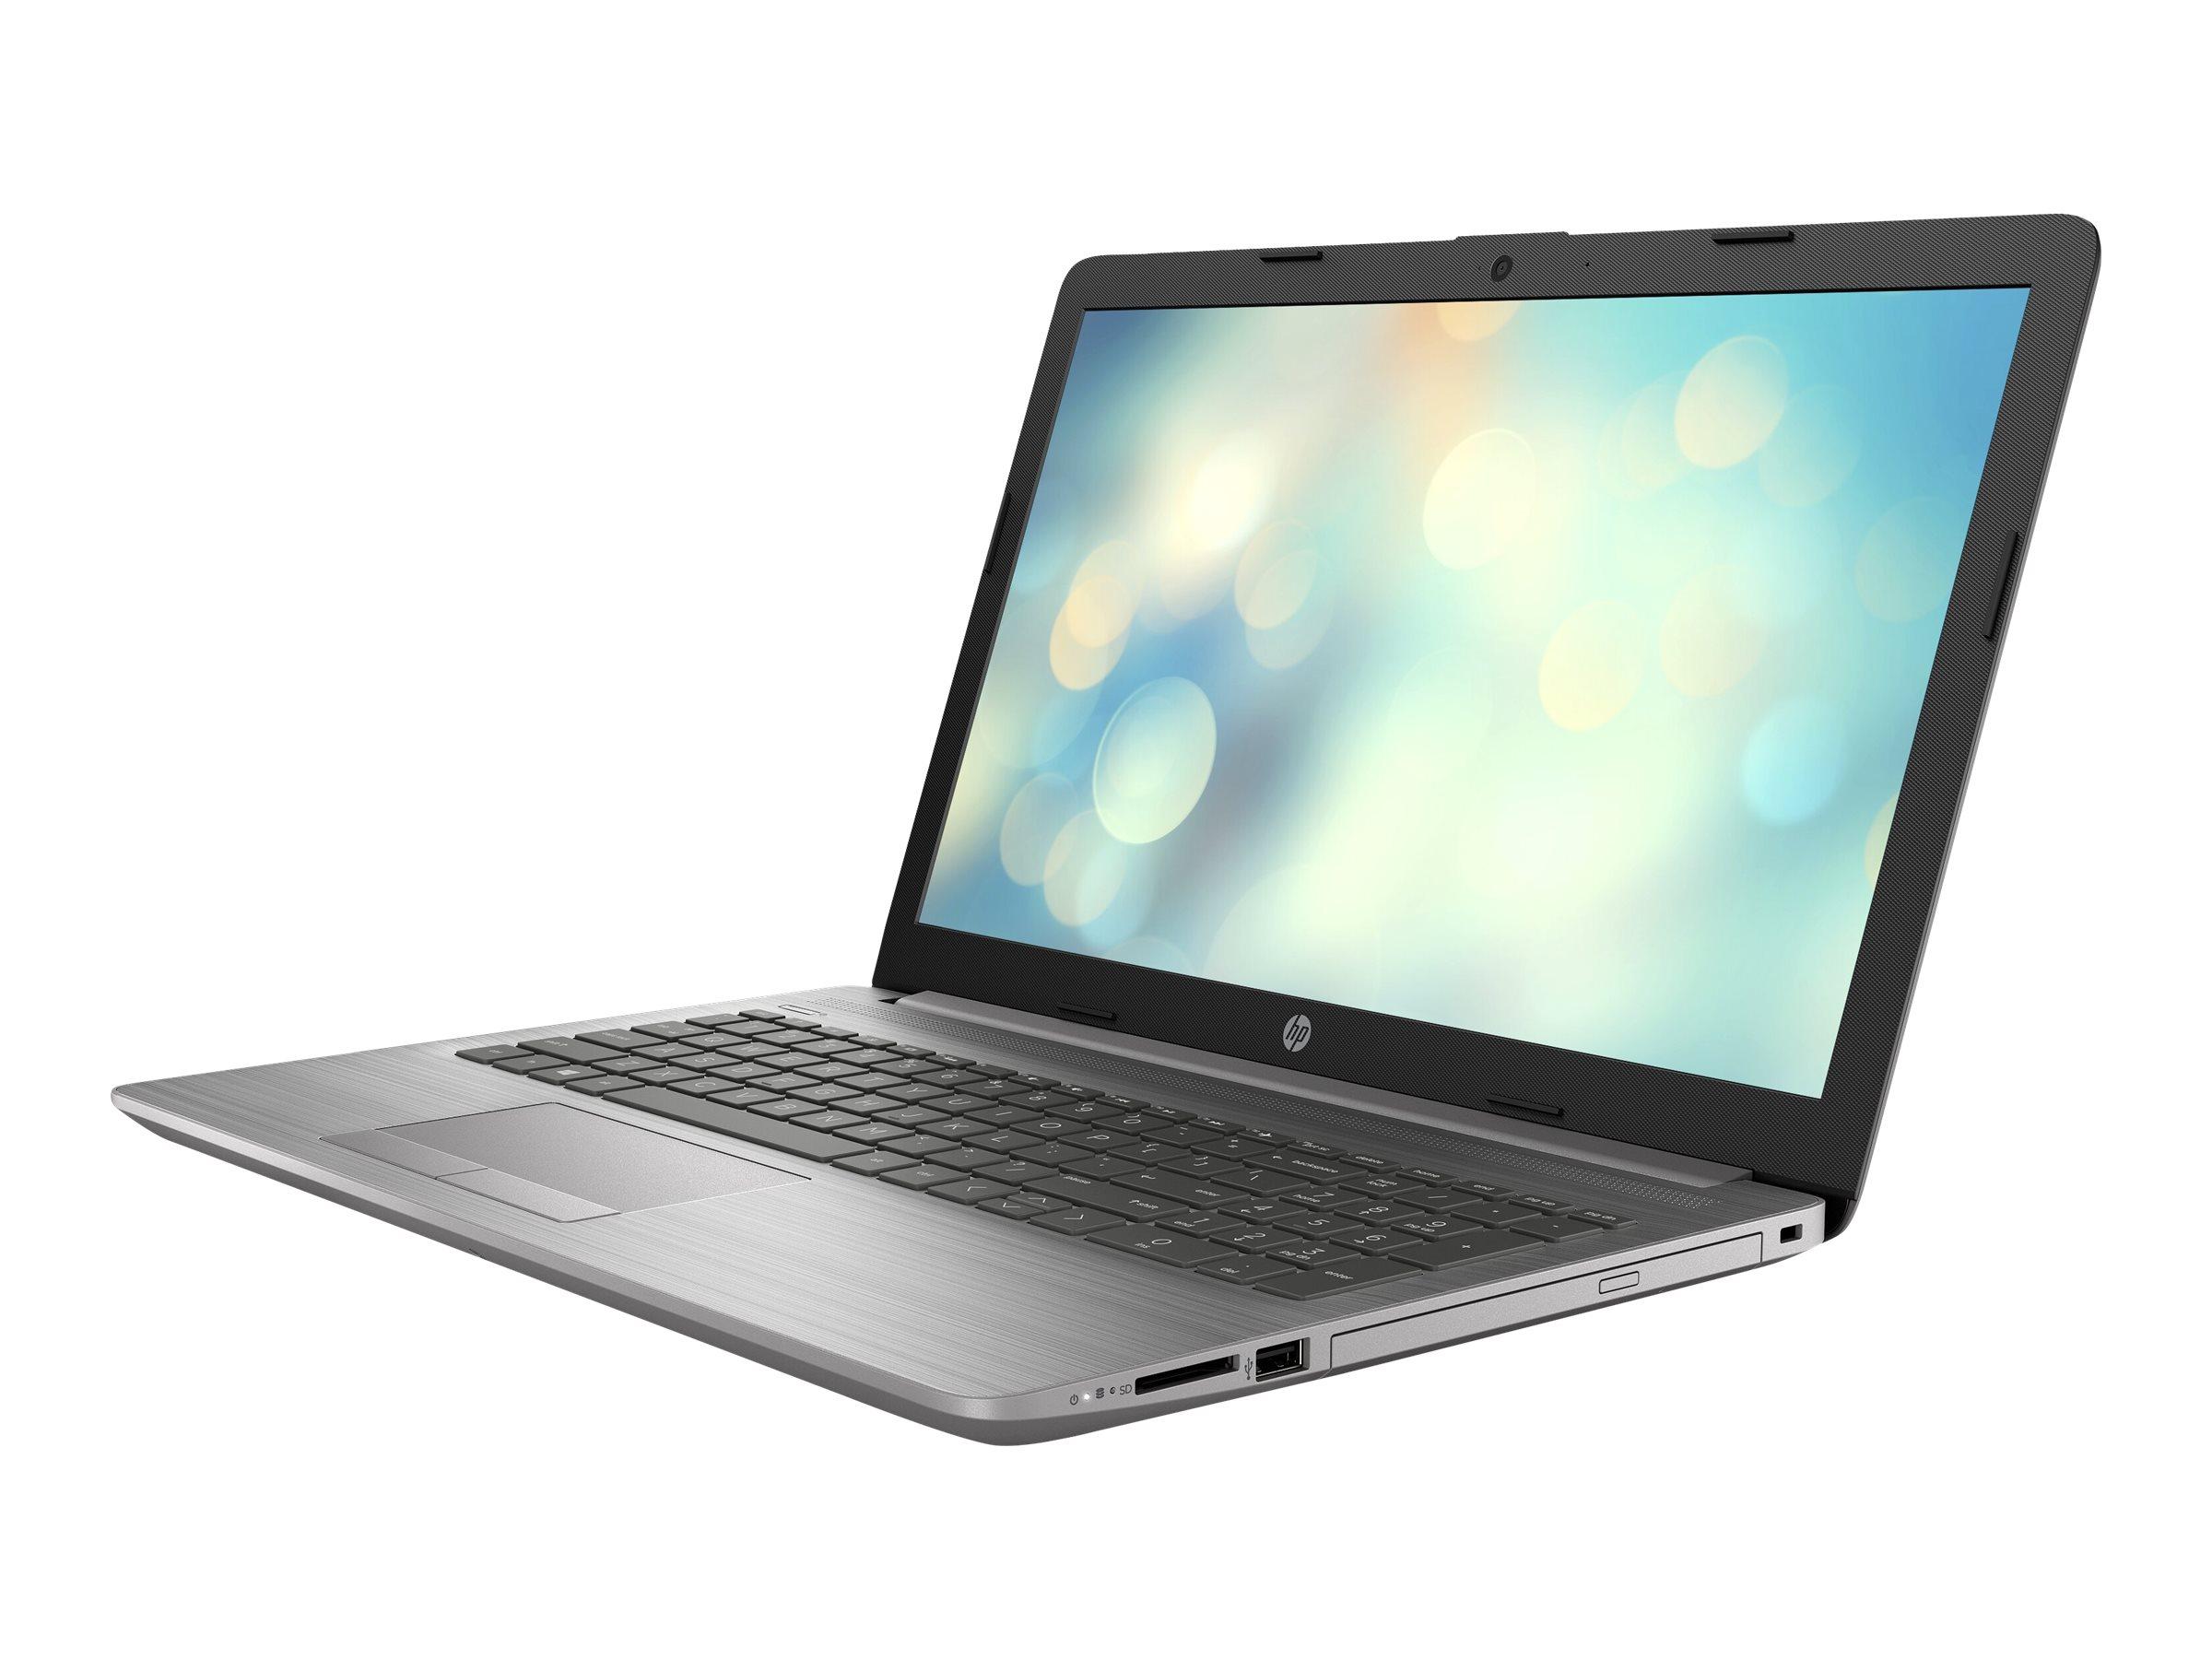 "HP 250 G7 - Core i3 1005G1 / 1.2 GHz - FreeDOS - 8 GB RAM - 256 GB SSD NVMe, HP Value - DVD-Writer - 39.6 cm (15.6"")"